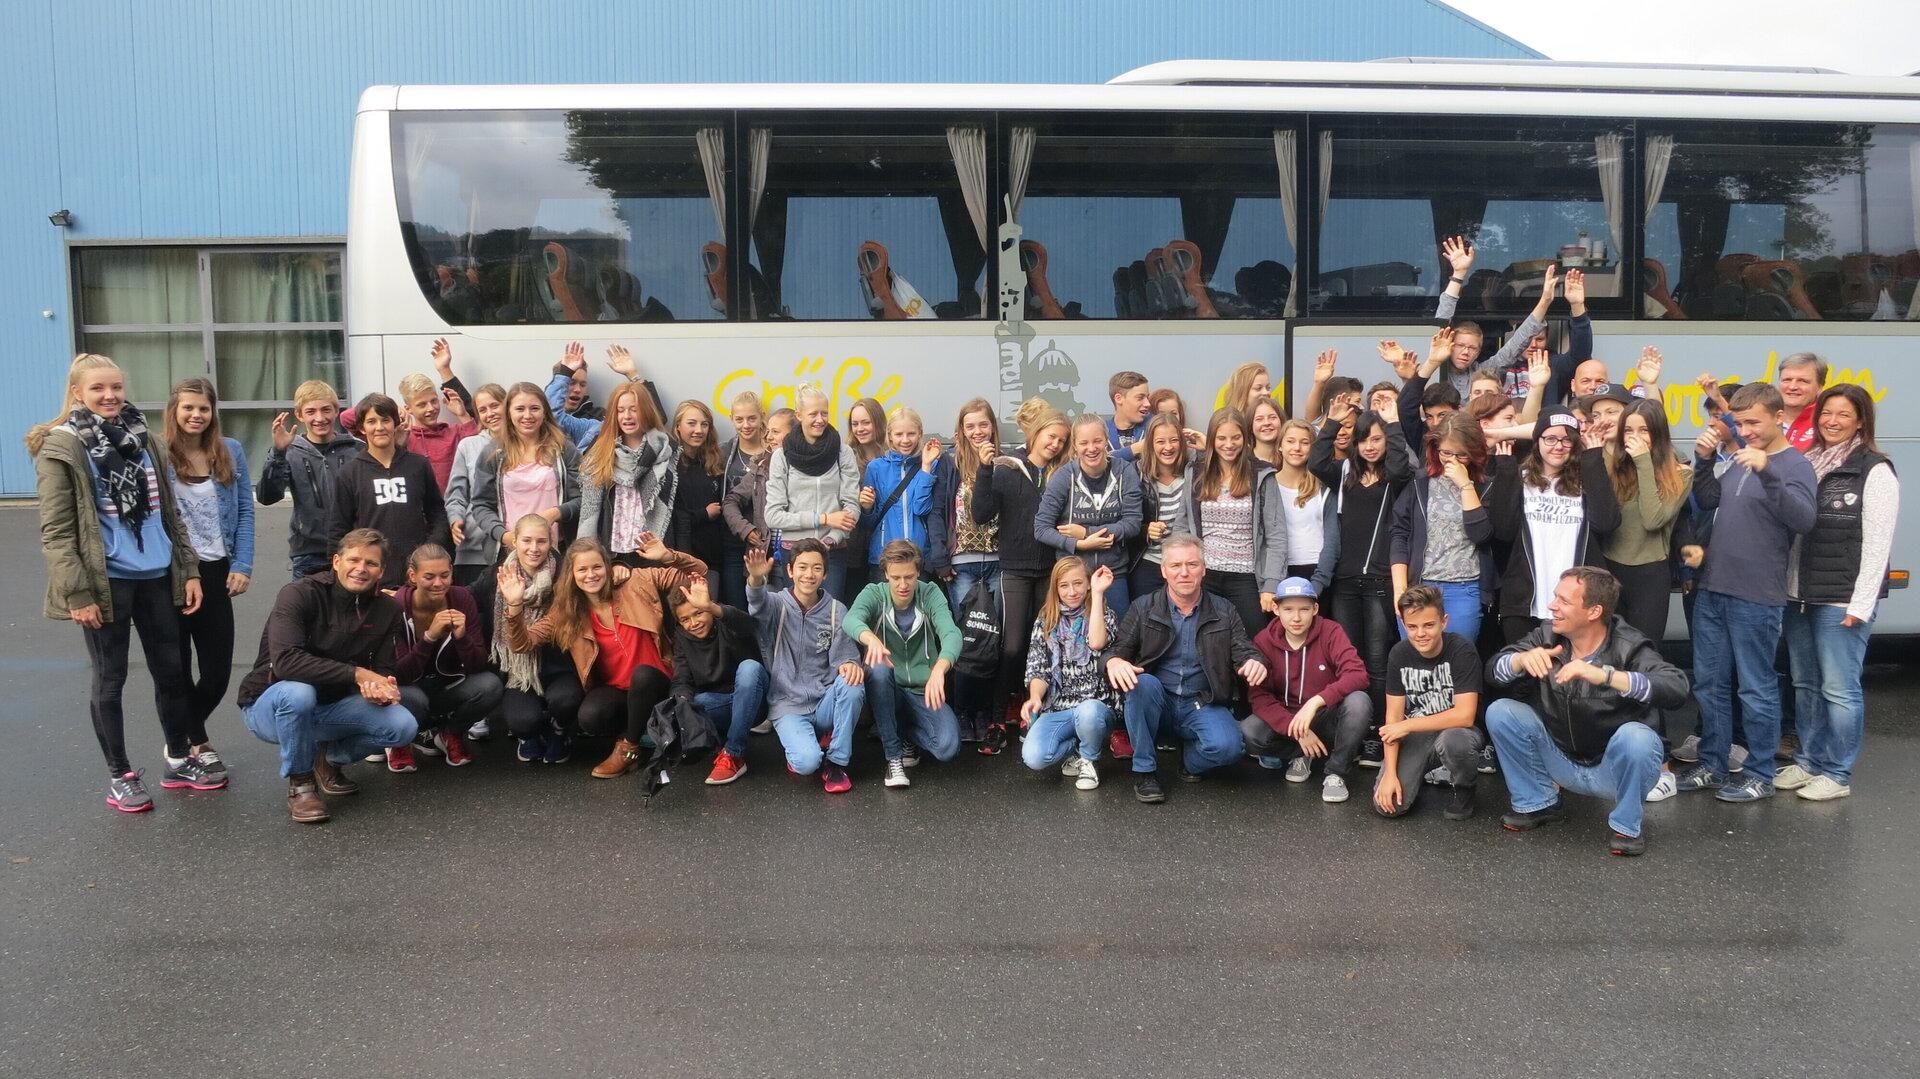 Jugendolympiade 2015 in Luzern